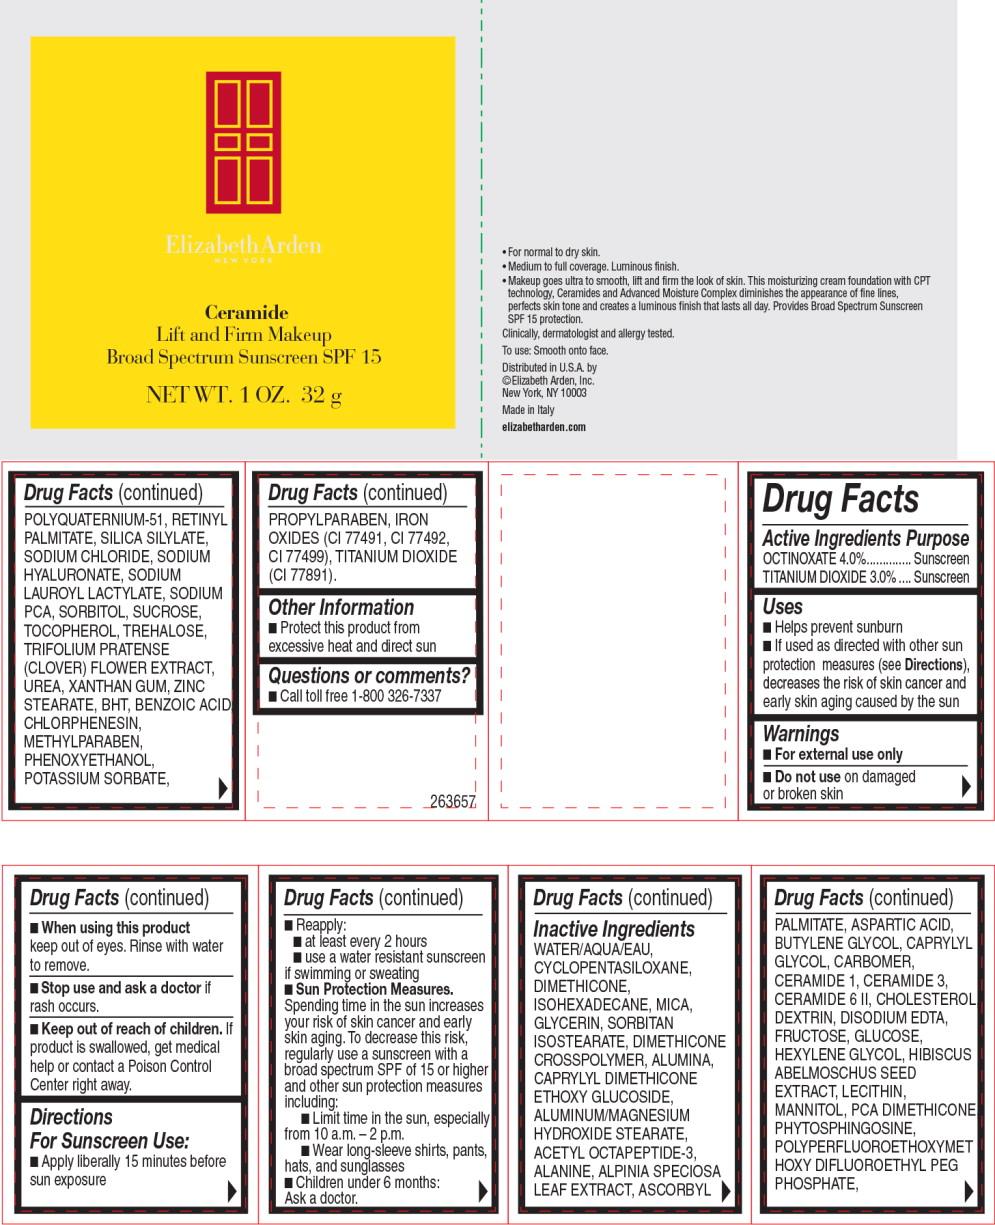 Ceramide Lift And Firm Makeup Broad Spectrum Sunscreen Spf 15 Warm Bisque (Octinoxate, Titanium Dioxide) Cream [Elizabeth Arden, Inc]